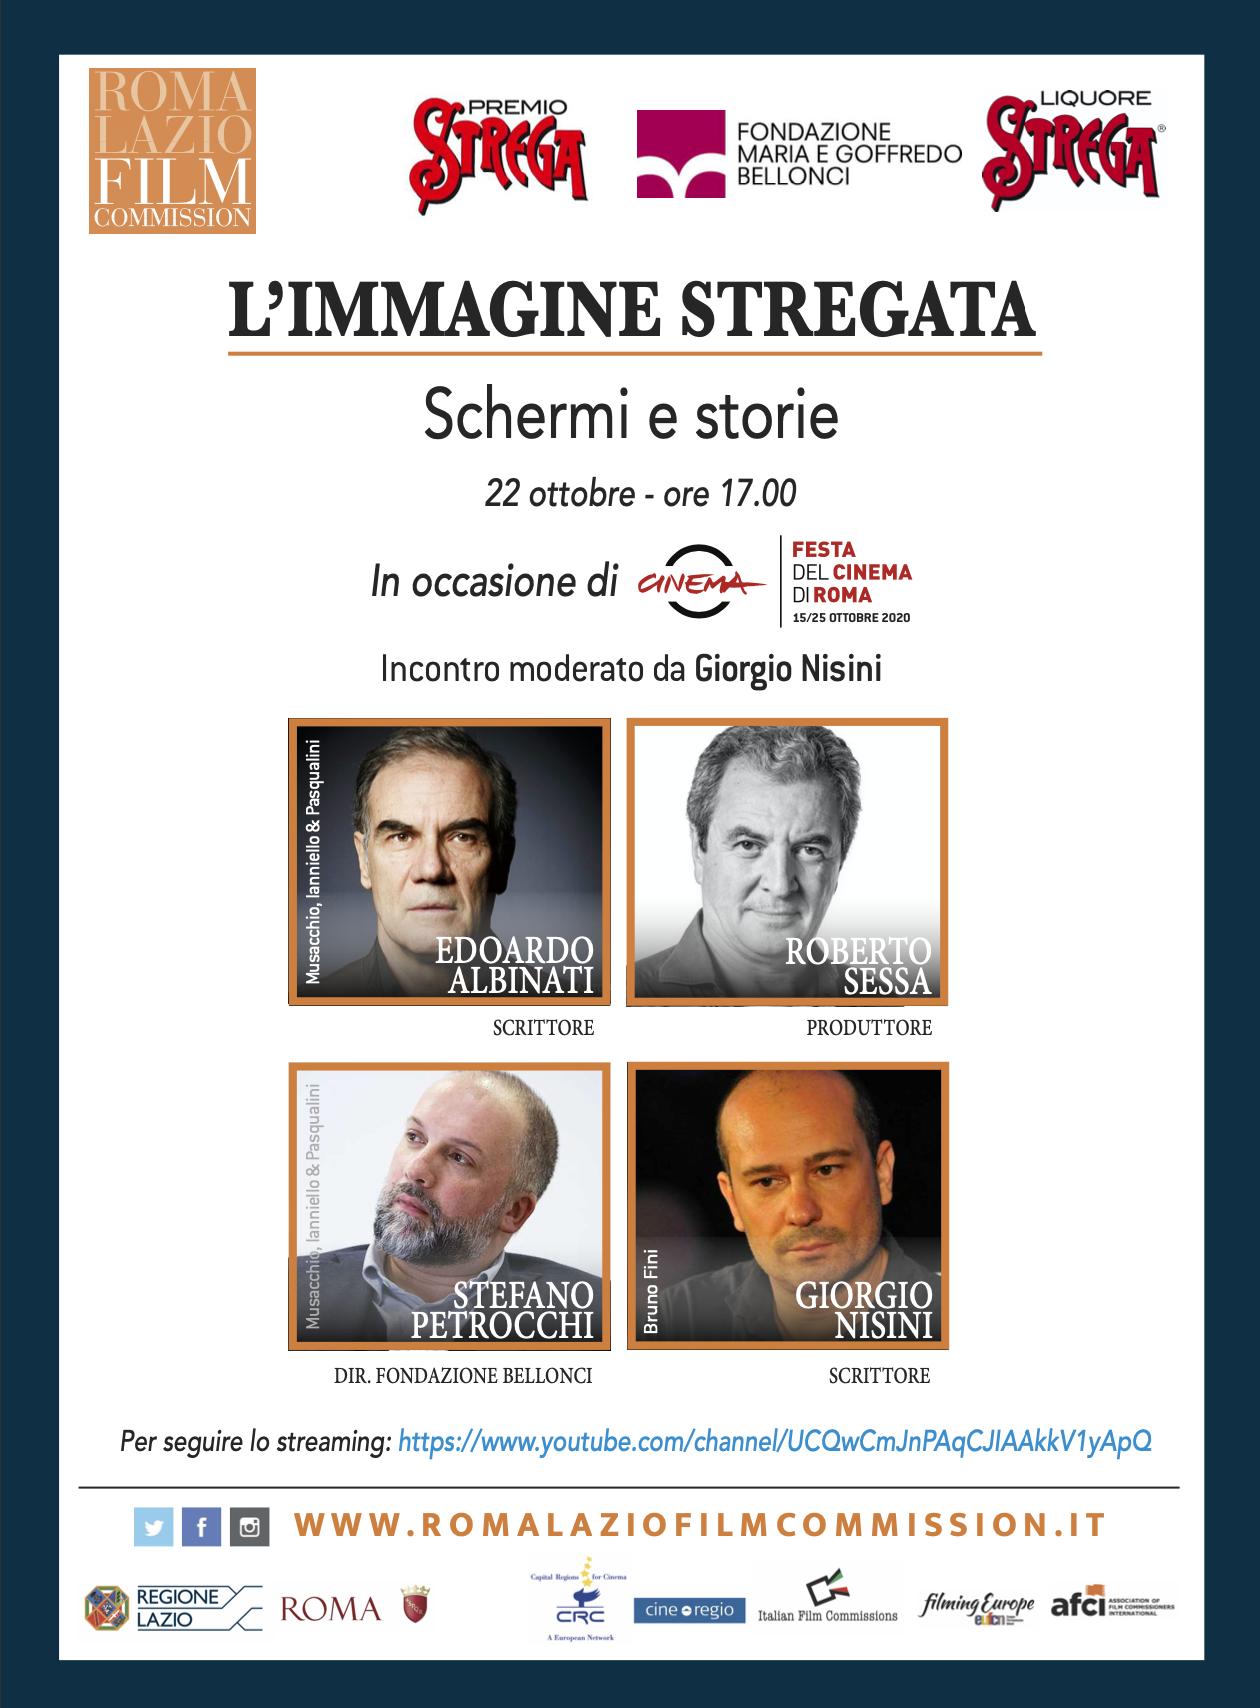 L'Immagine Stregata Schermi e storie